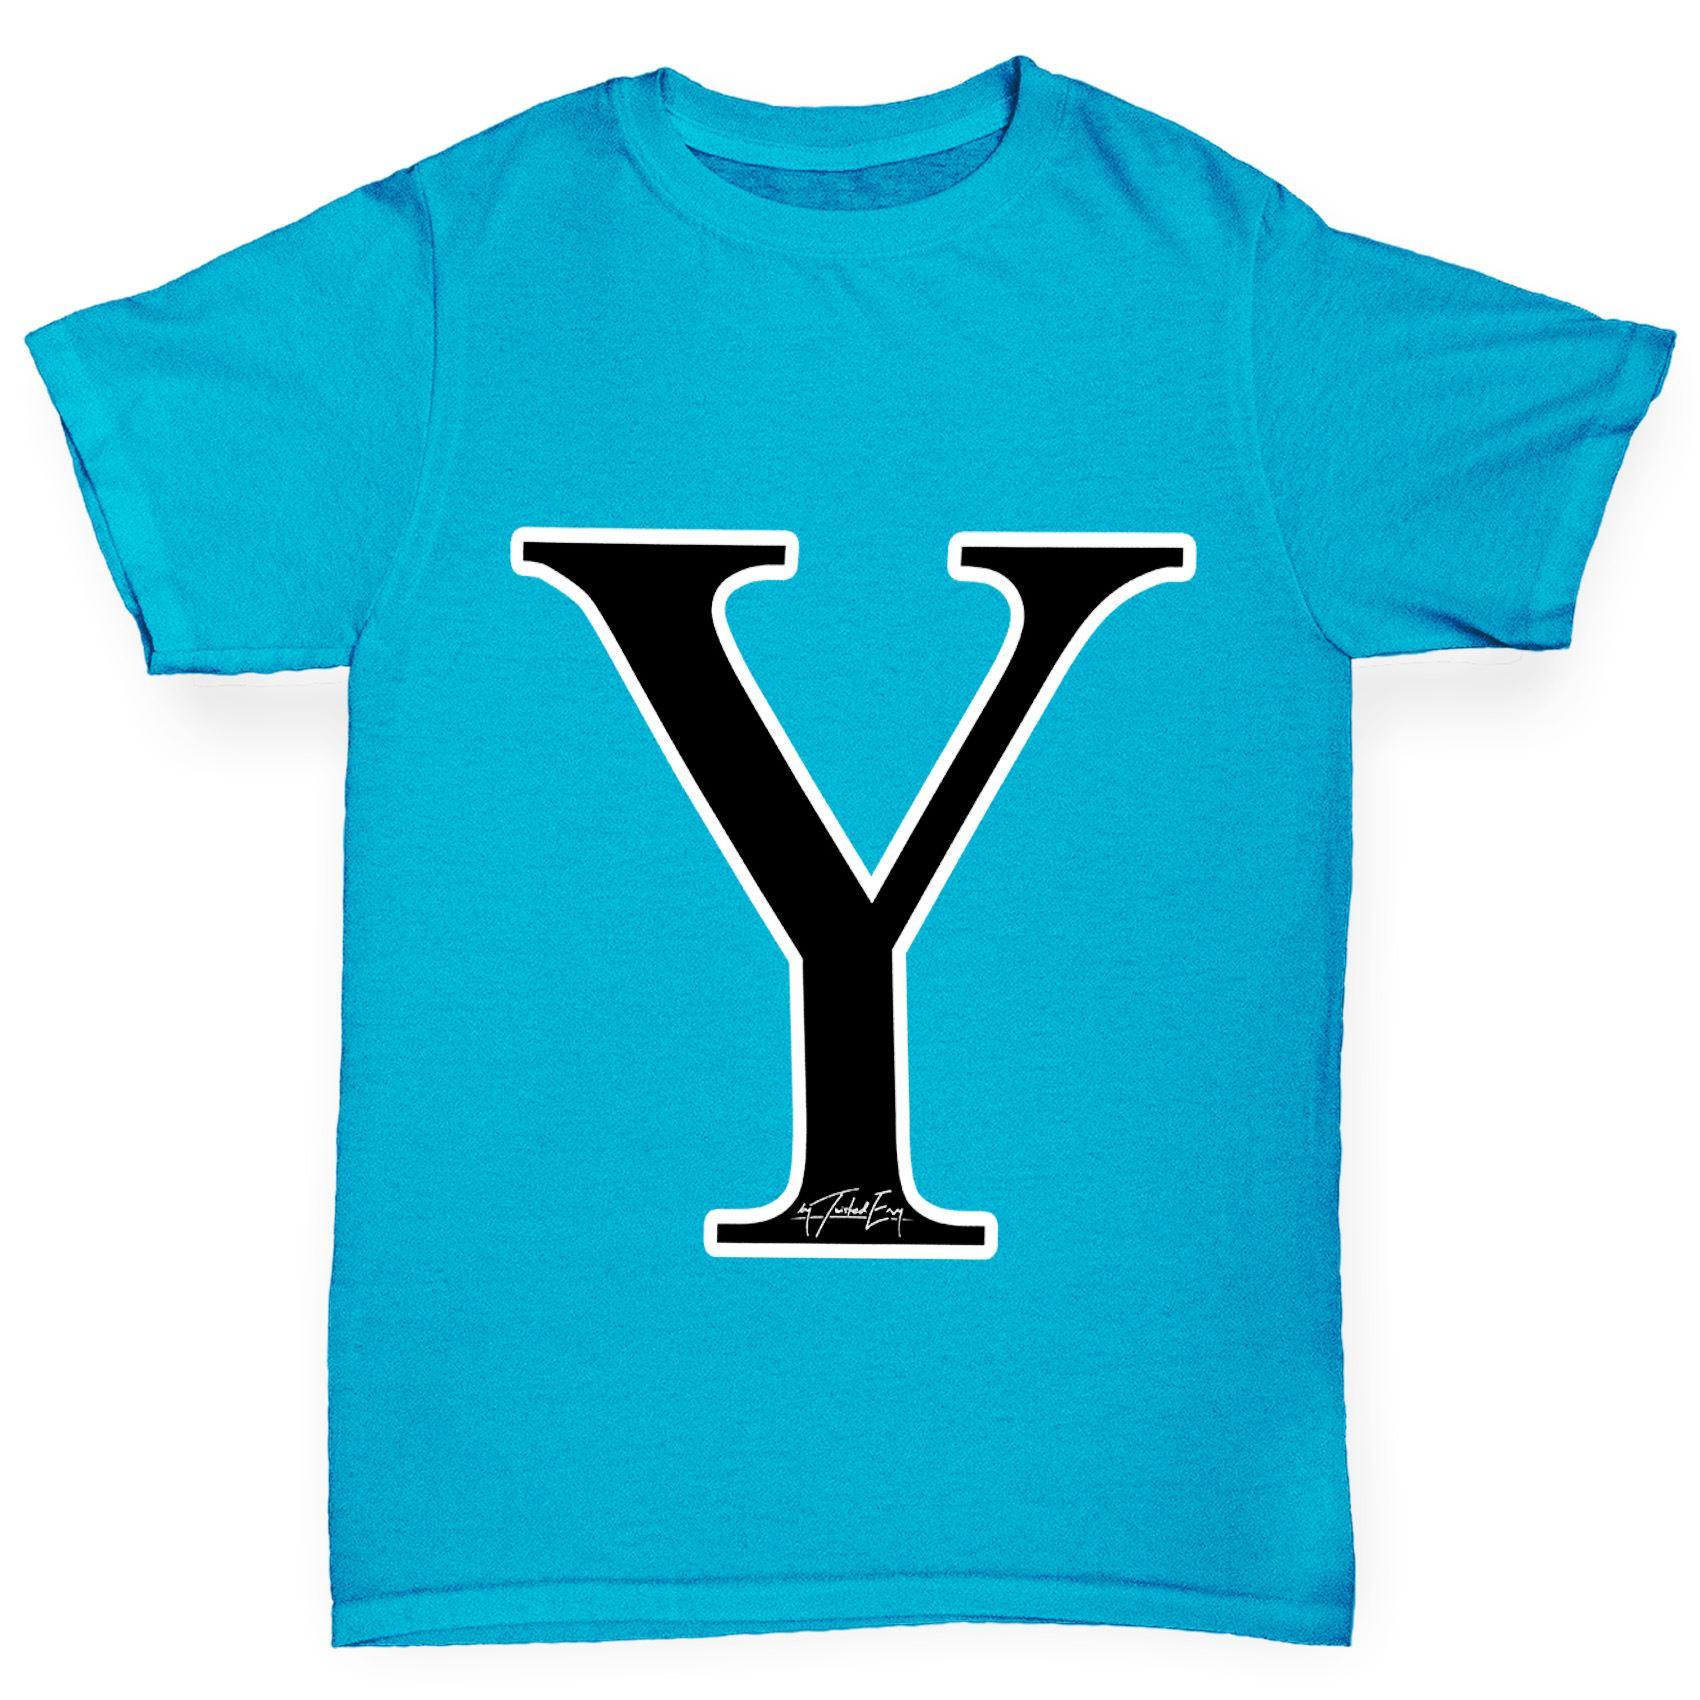 Russell J166B Boys Kids V-Neck HD Tee TShirt Polycotton Plain Short Sleeves Tops